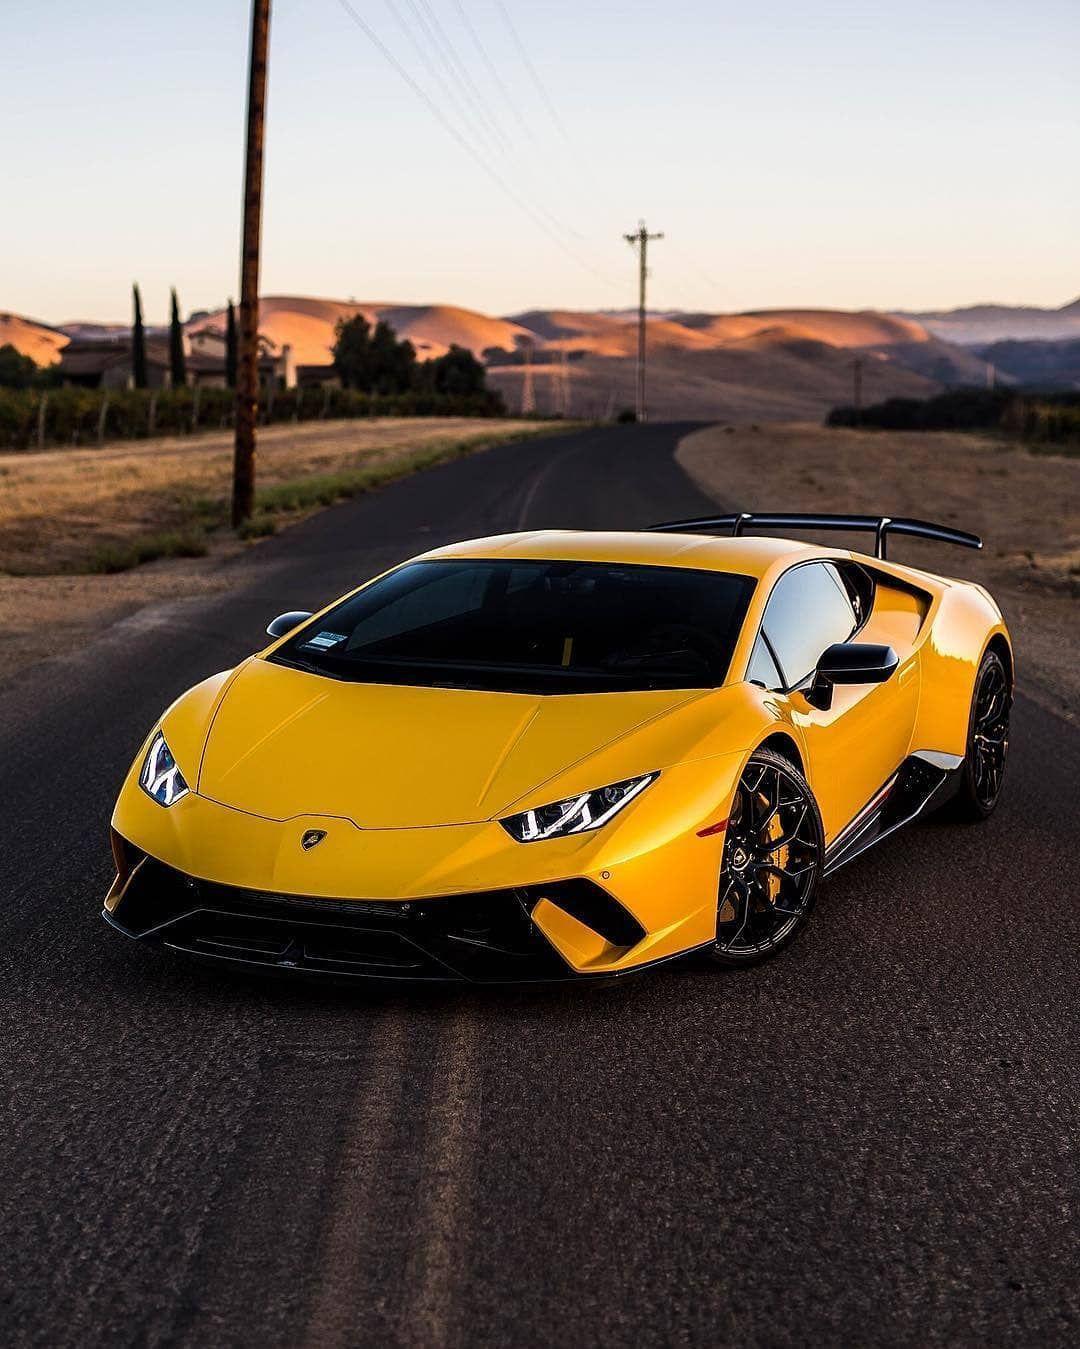 Lamborghini Car Photos On Instagram Lambocarphoto Lamborghini Huracan Pic By Californiae In 2020 Lamborghini Cars Sports Cars Luxury Sports Cars Lamborghini